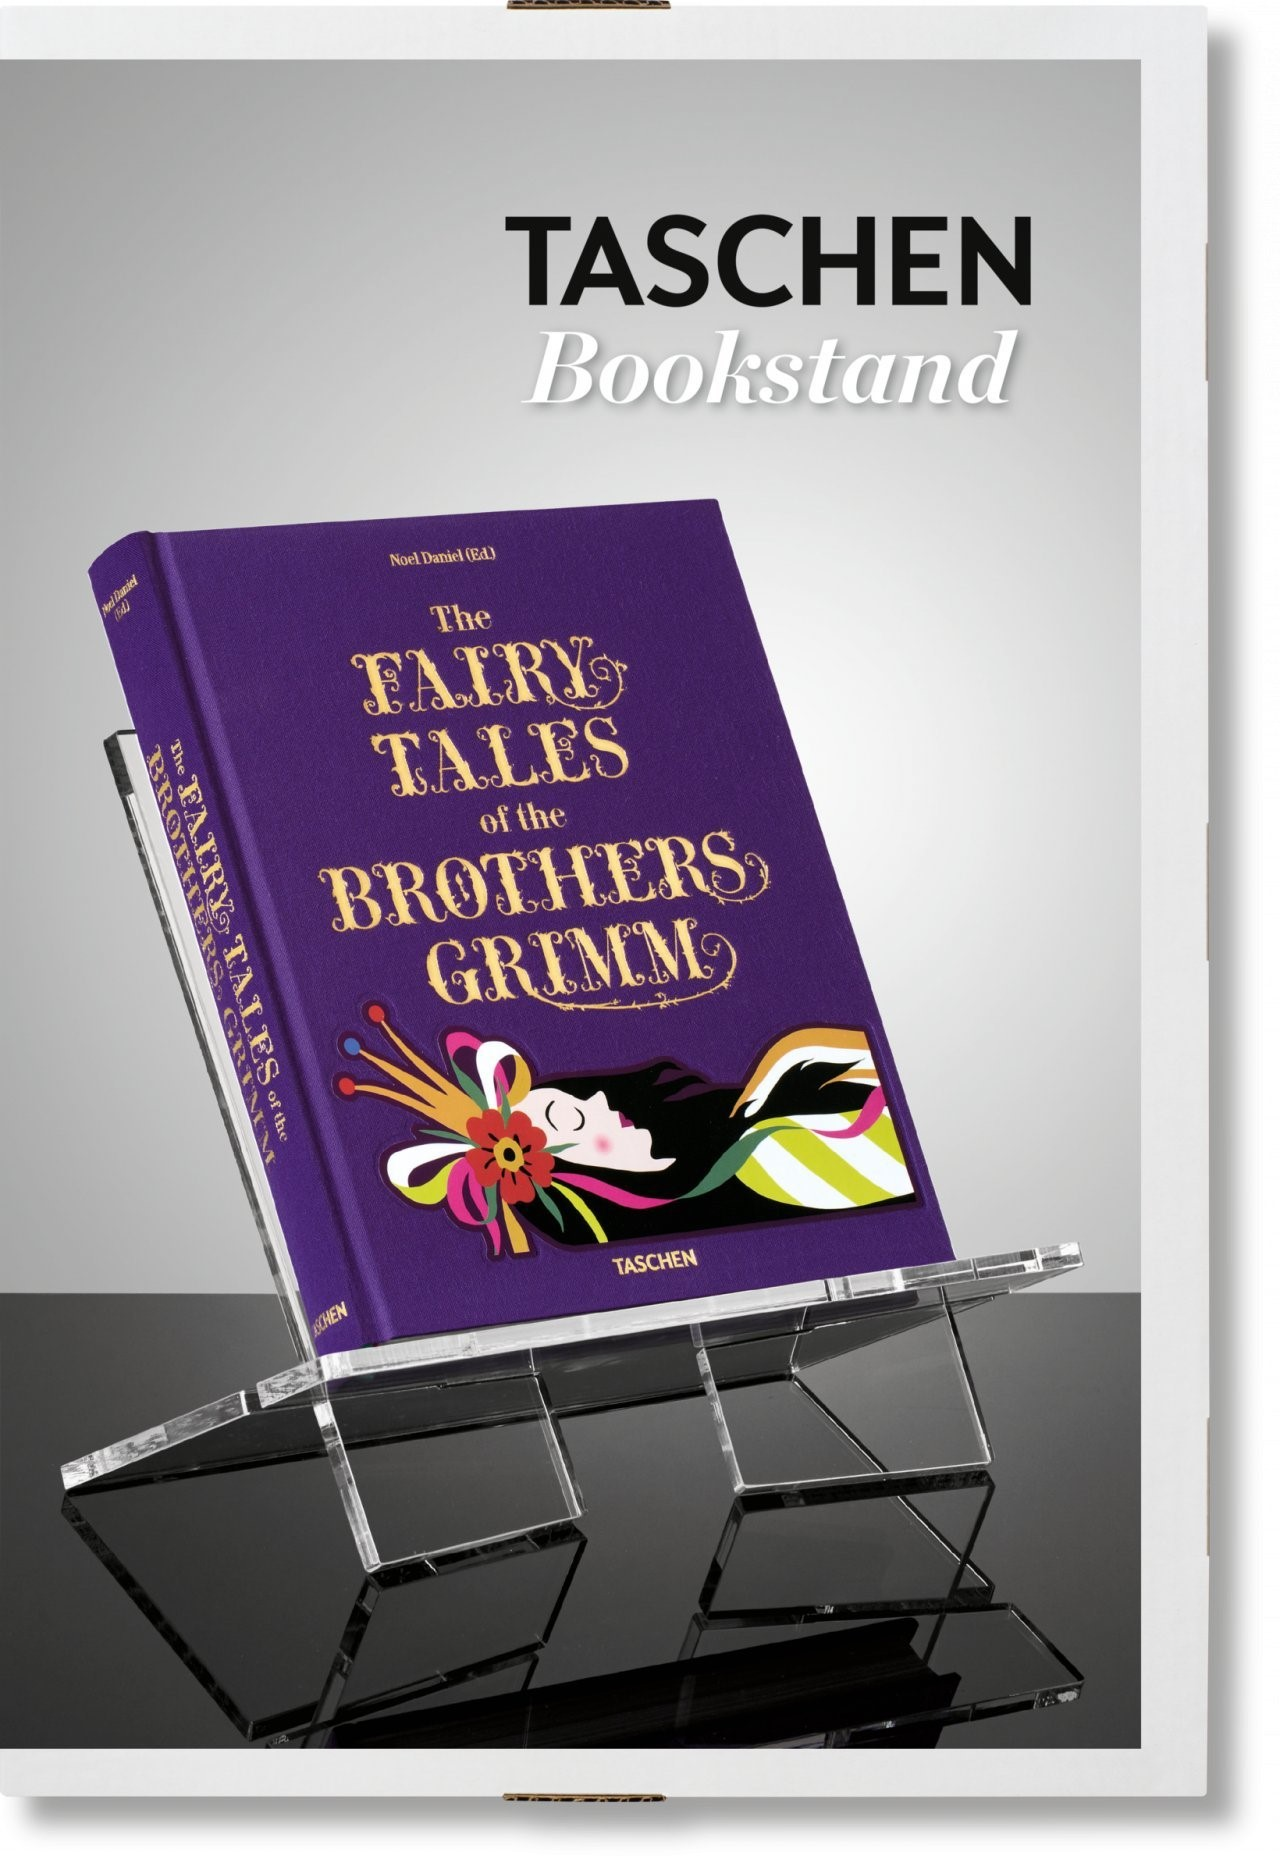 Bookstand, Size M, 2018 (Cover)